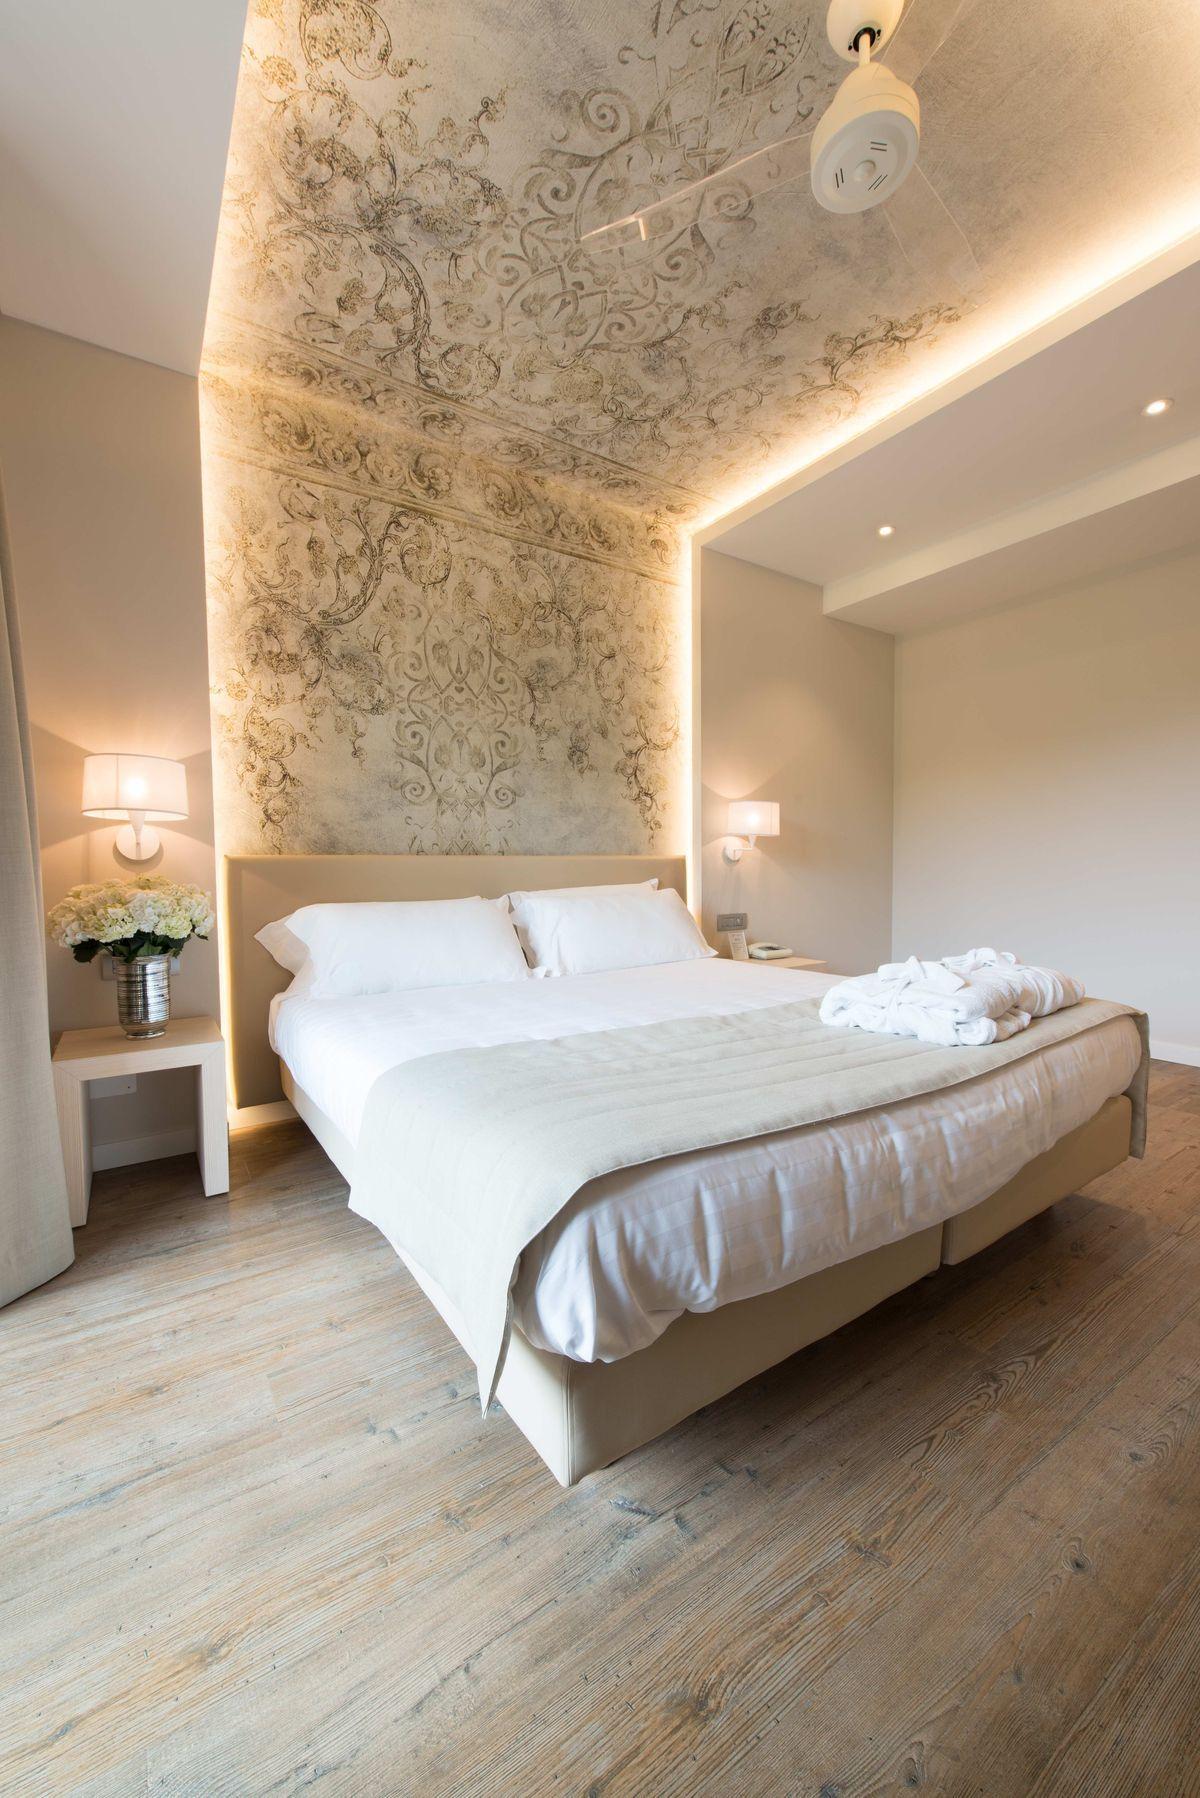 2debaed3a64de250c113701745347c42.jpg 1.200×1.798 pixel | bed rooms ...